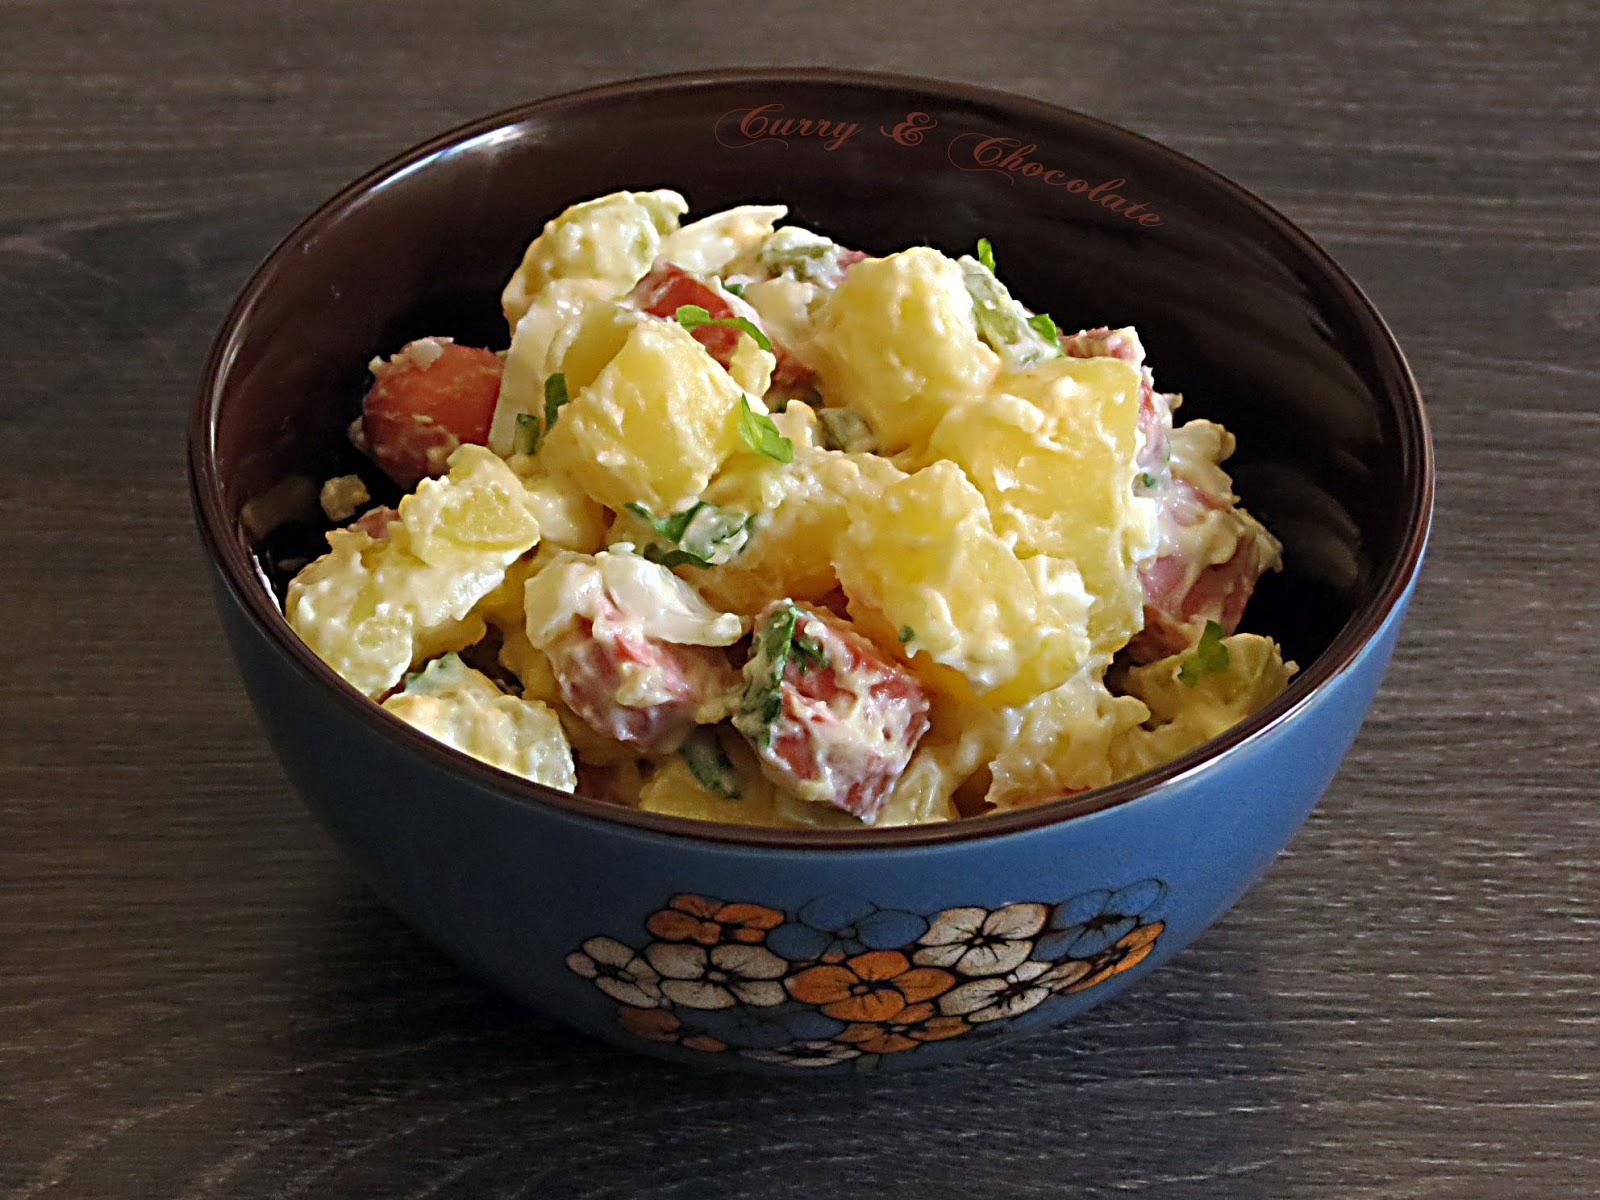 Ensalada alemana de patatas o kartoffelsalat  - German potato salad